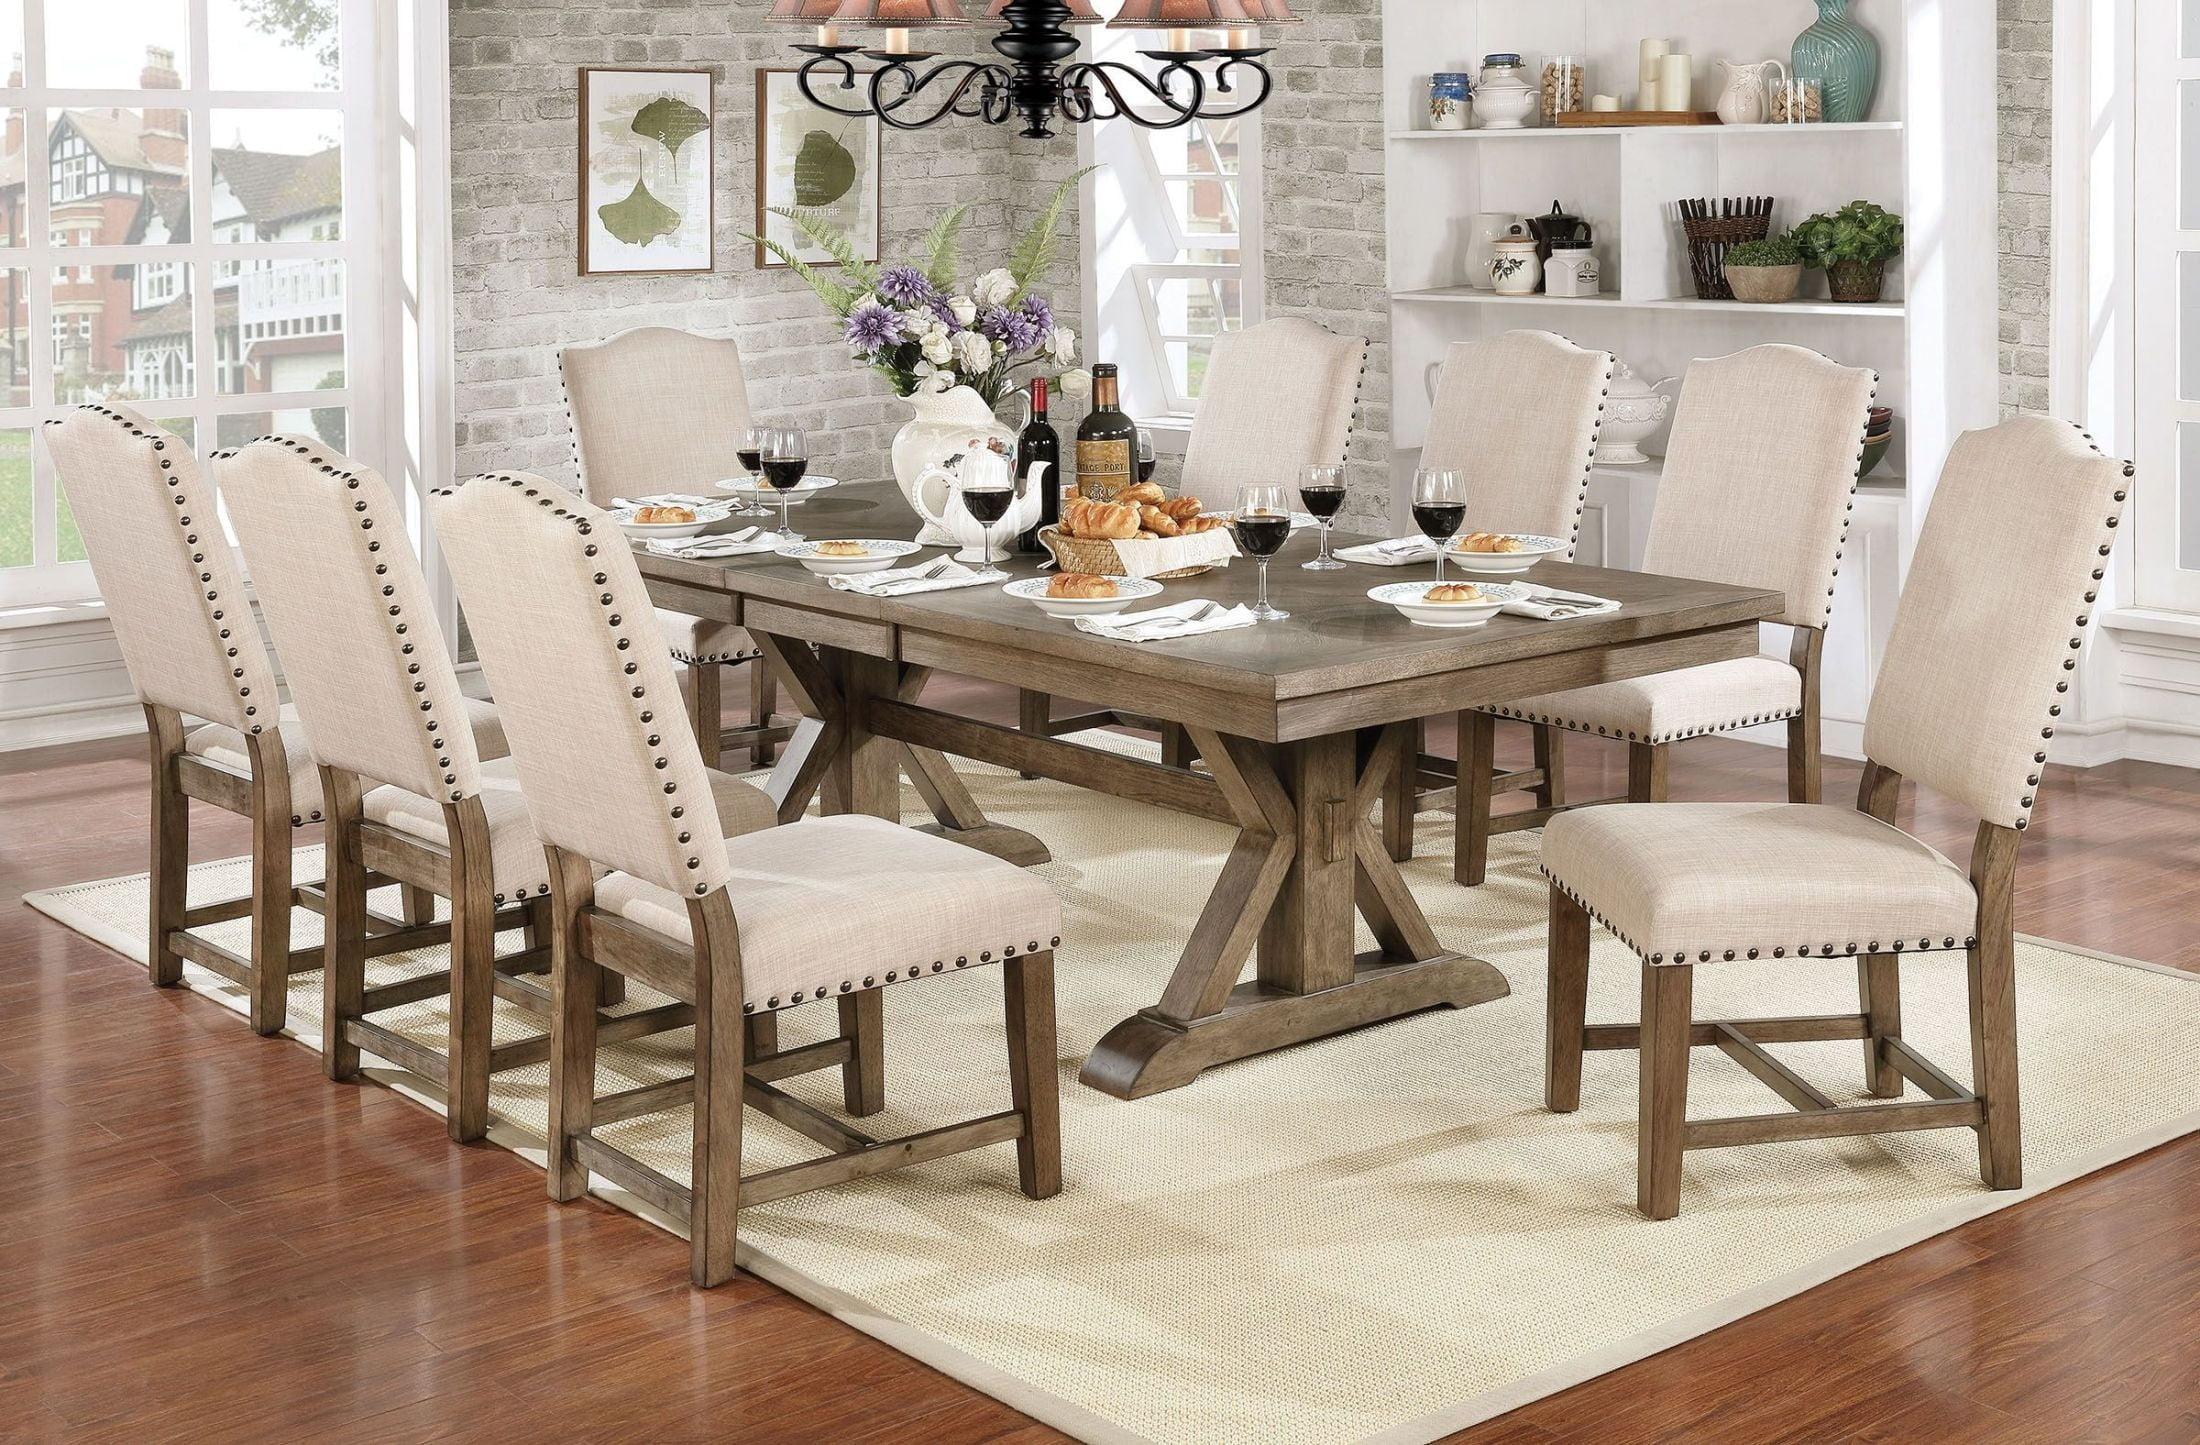 Julia Light Oak Extendable Dining Room Set from Furniture  : cm3014t 11 from colemanfurniture.com size 2200 x 1445 jpeg 669kB